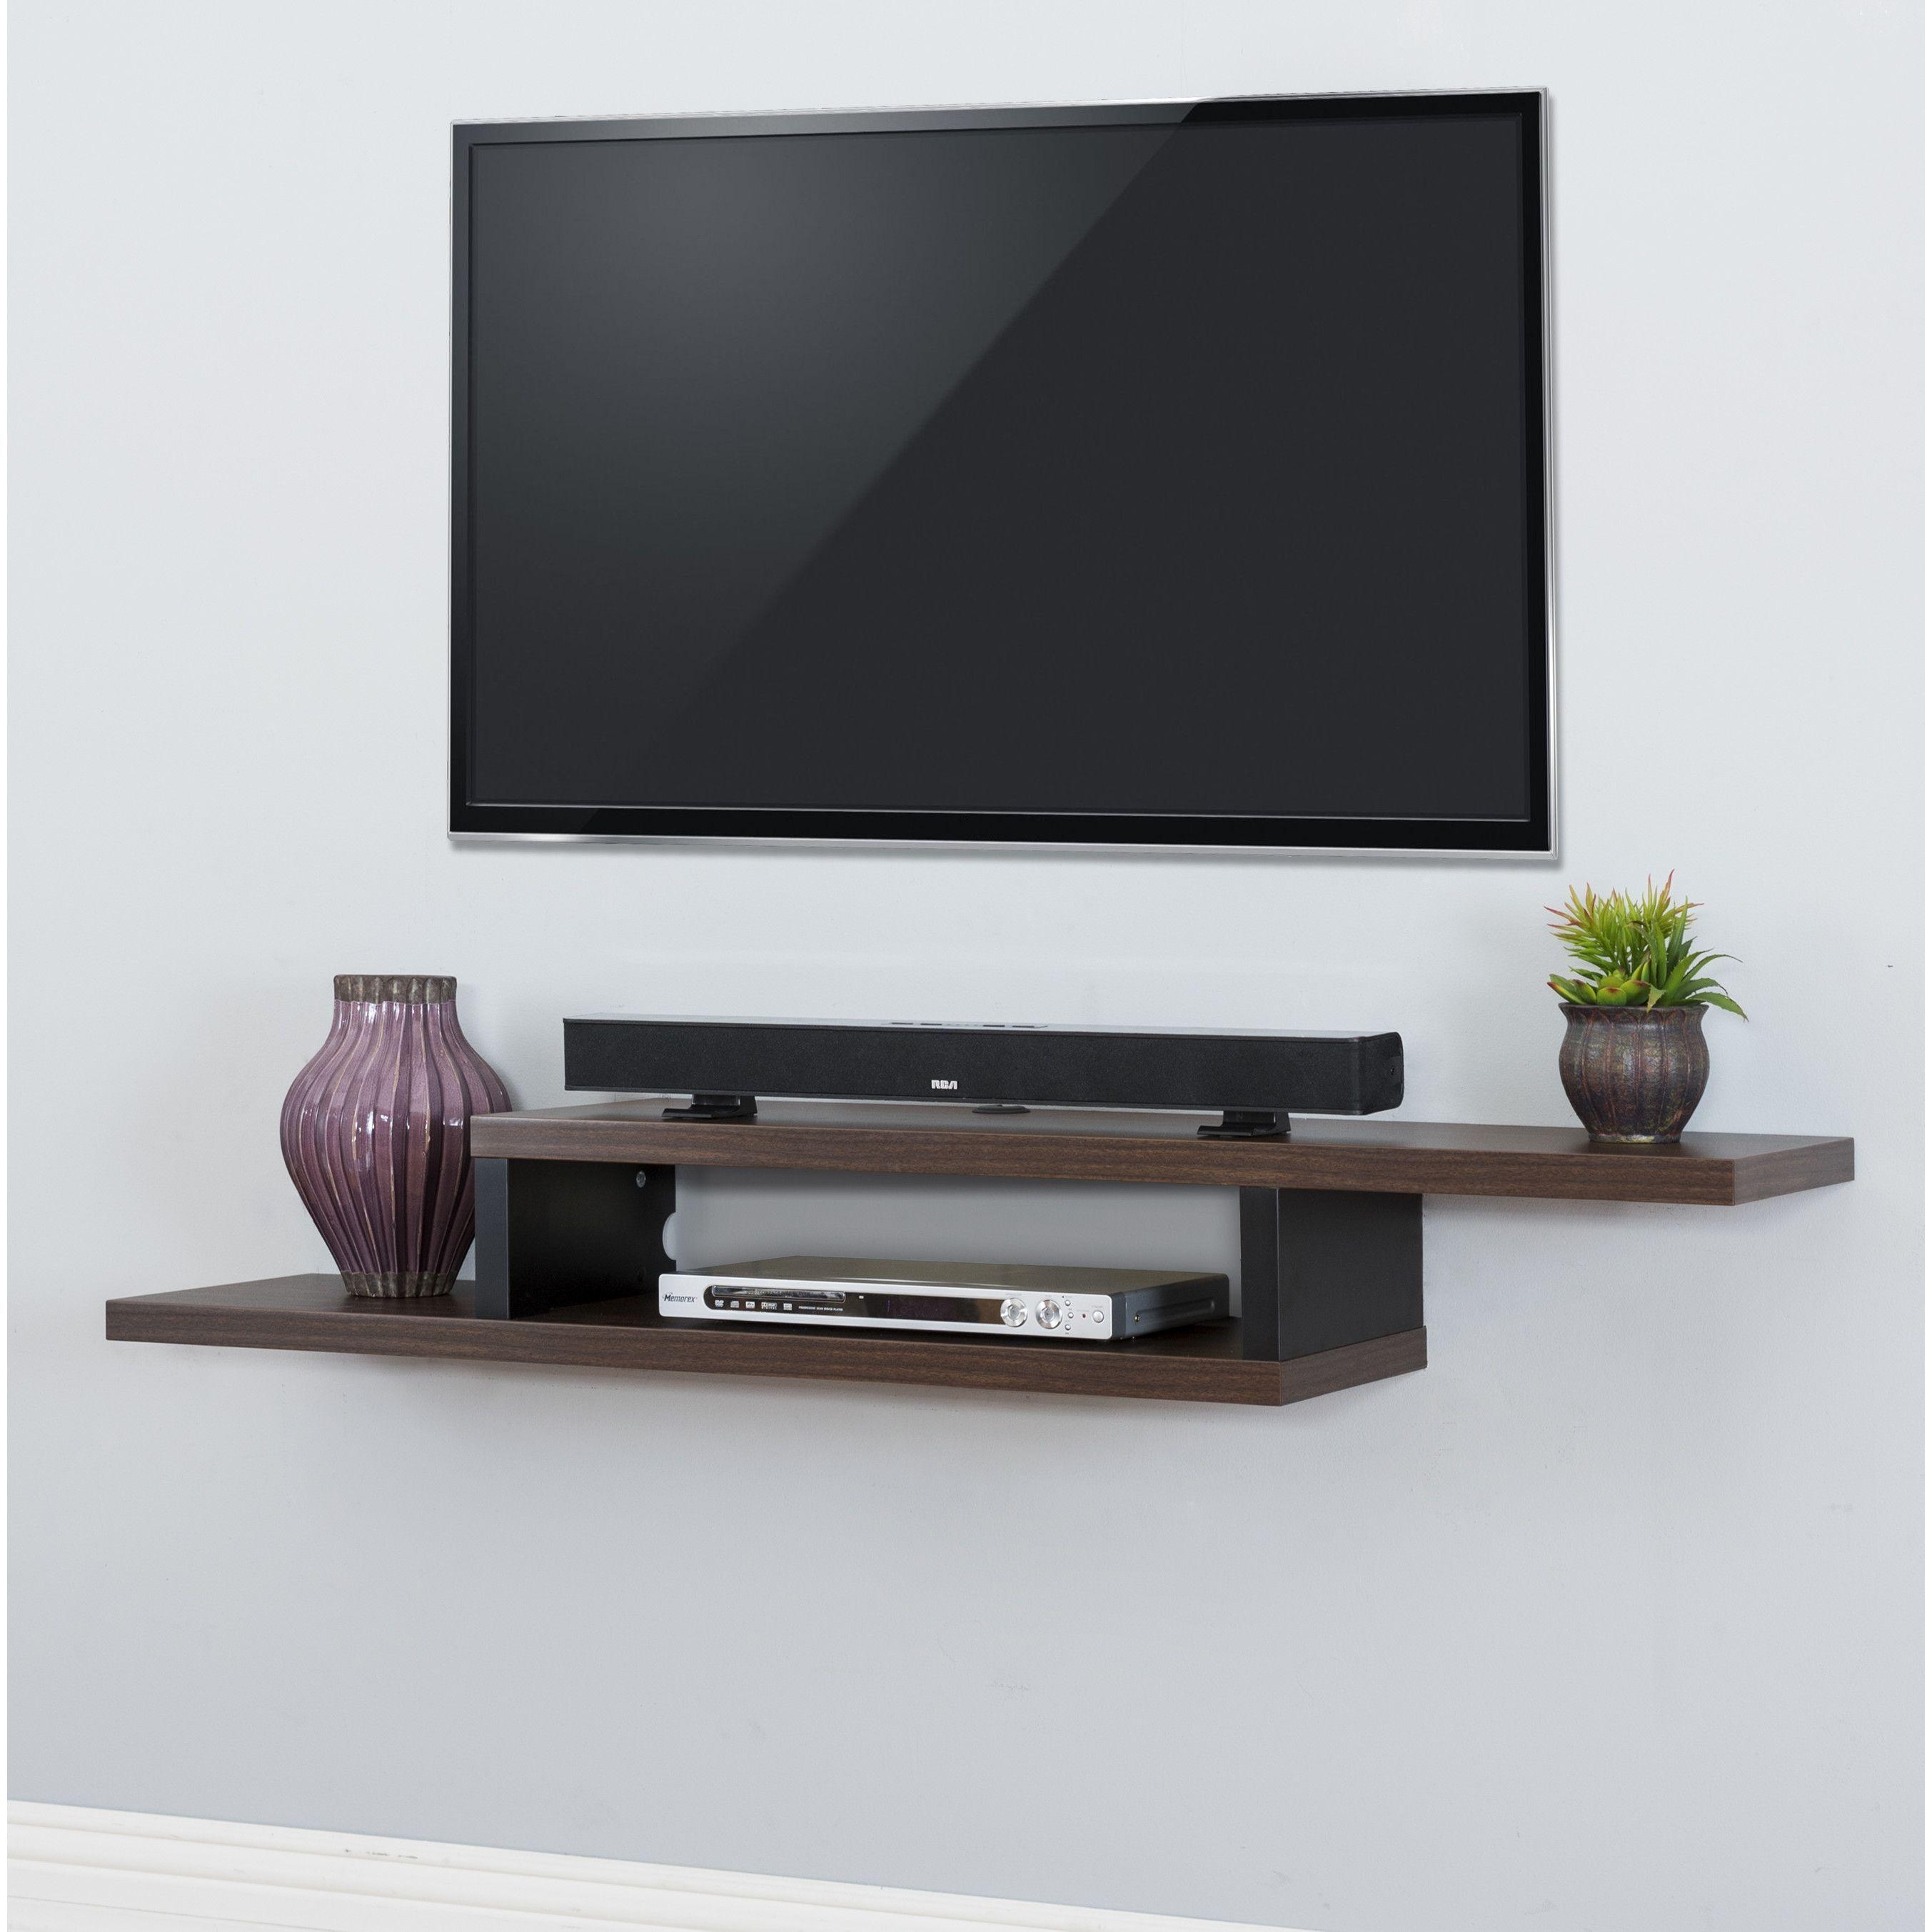 astonishing shelves for wall mount tv components 50 for your urban rh pinterest com Shelves Under Mounted TV Glass Wall Mounted TV Shelves